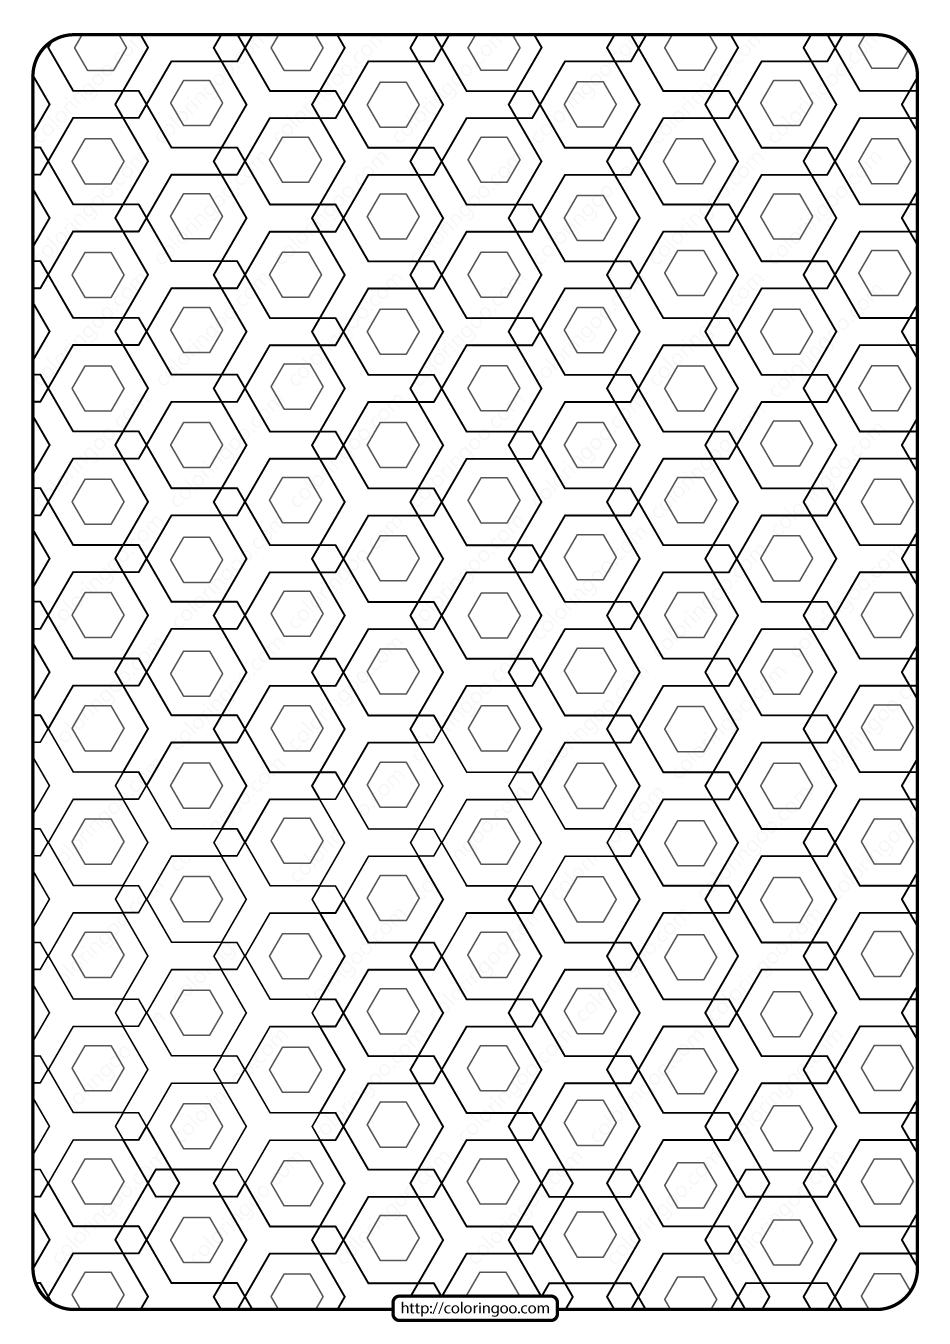 Free Printable Geometric Pattern Pdf Book 010 In 2020 Geometric